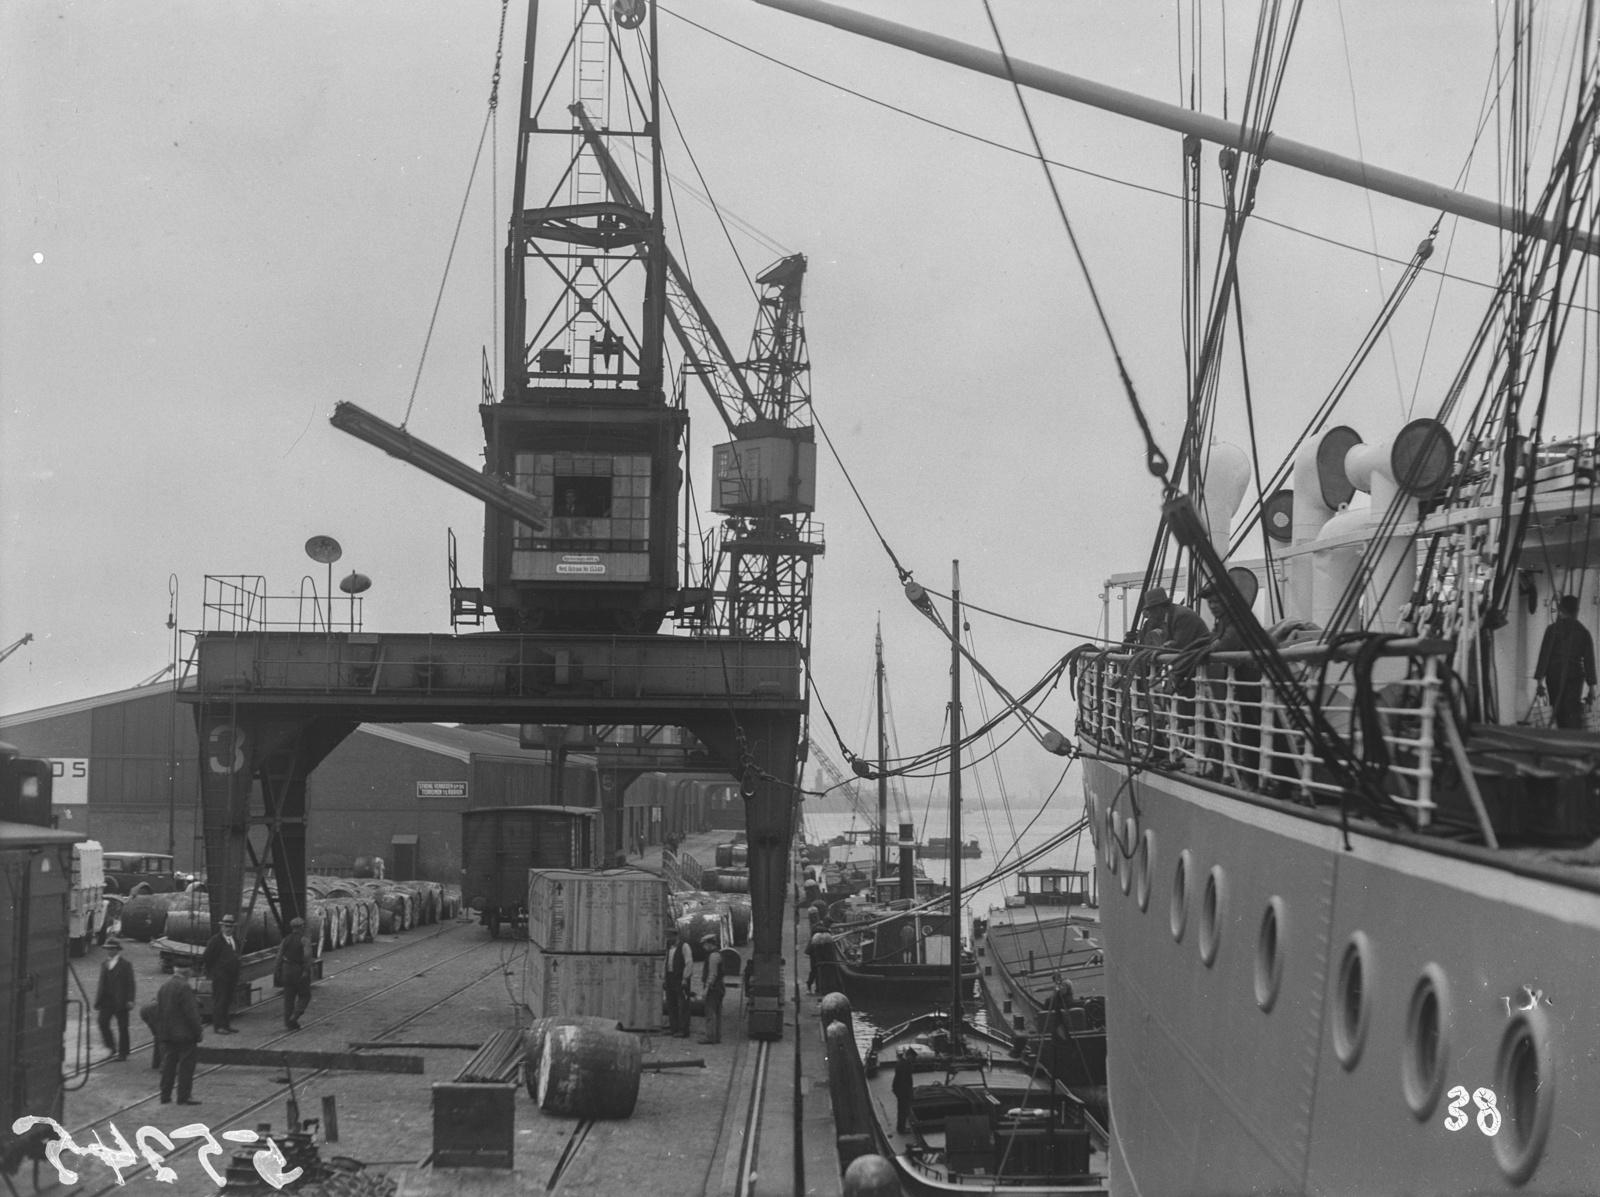 Антверпен. Вид на порт Антверпена с пароходом, краном и причалом